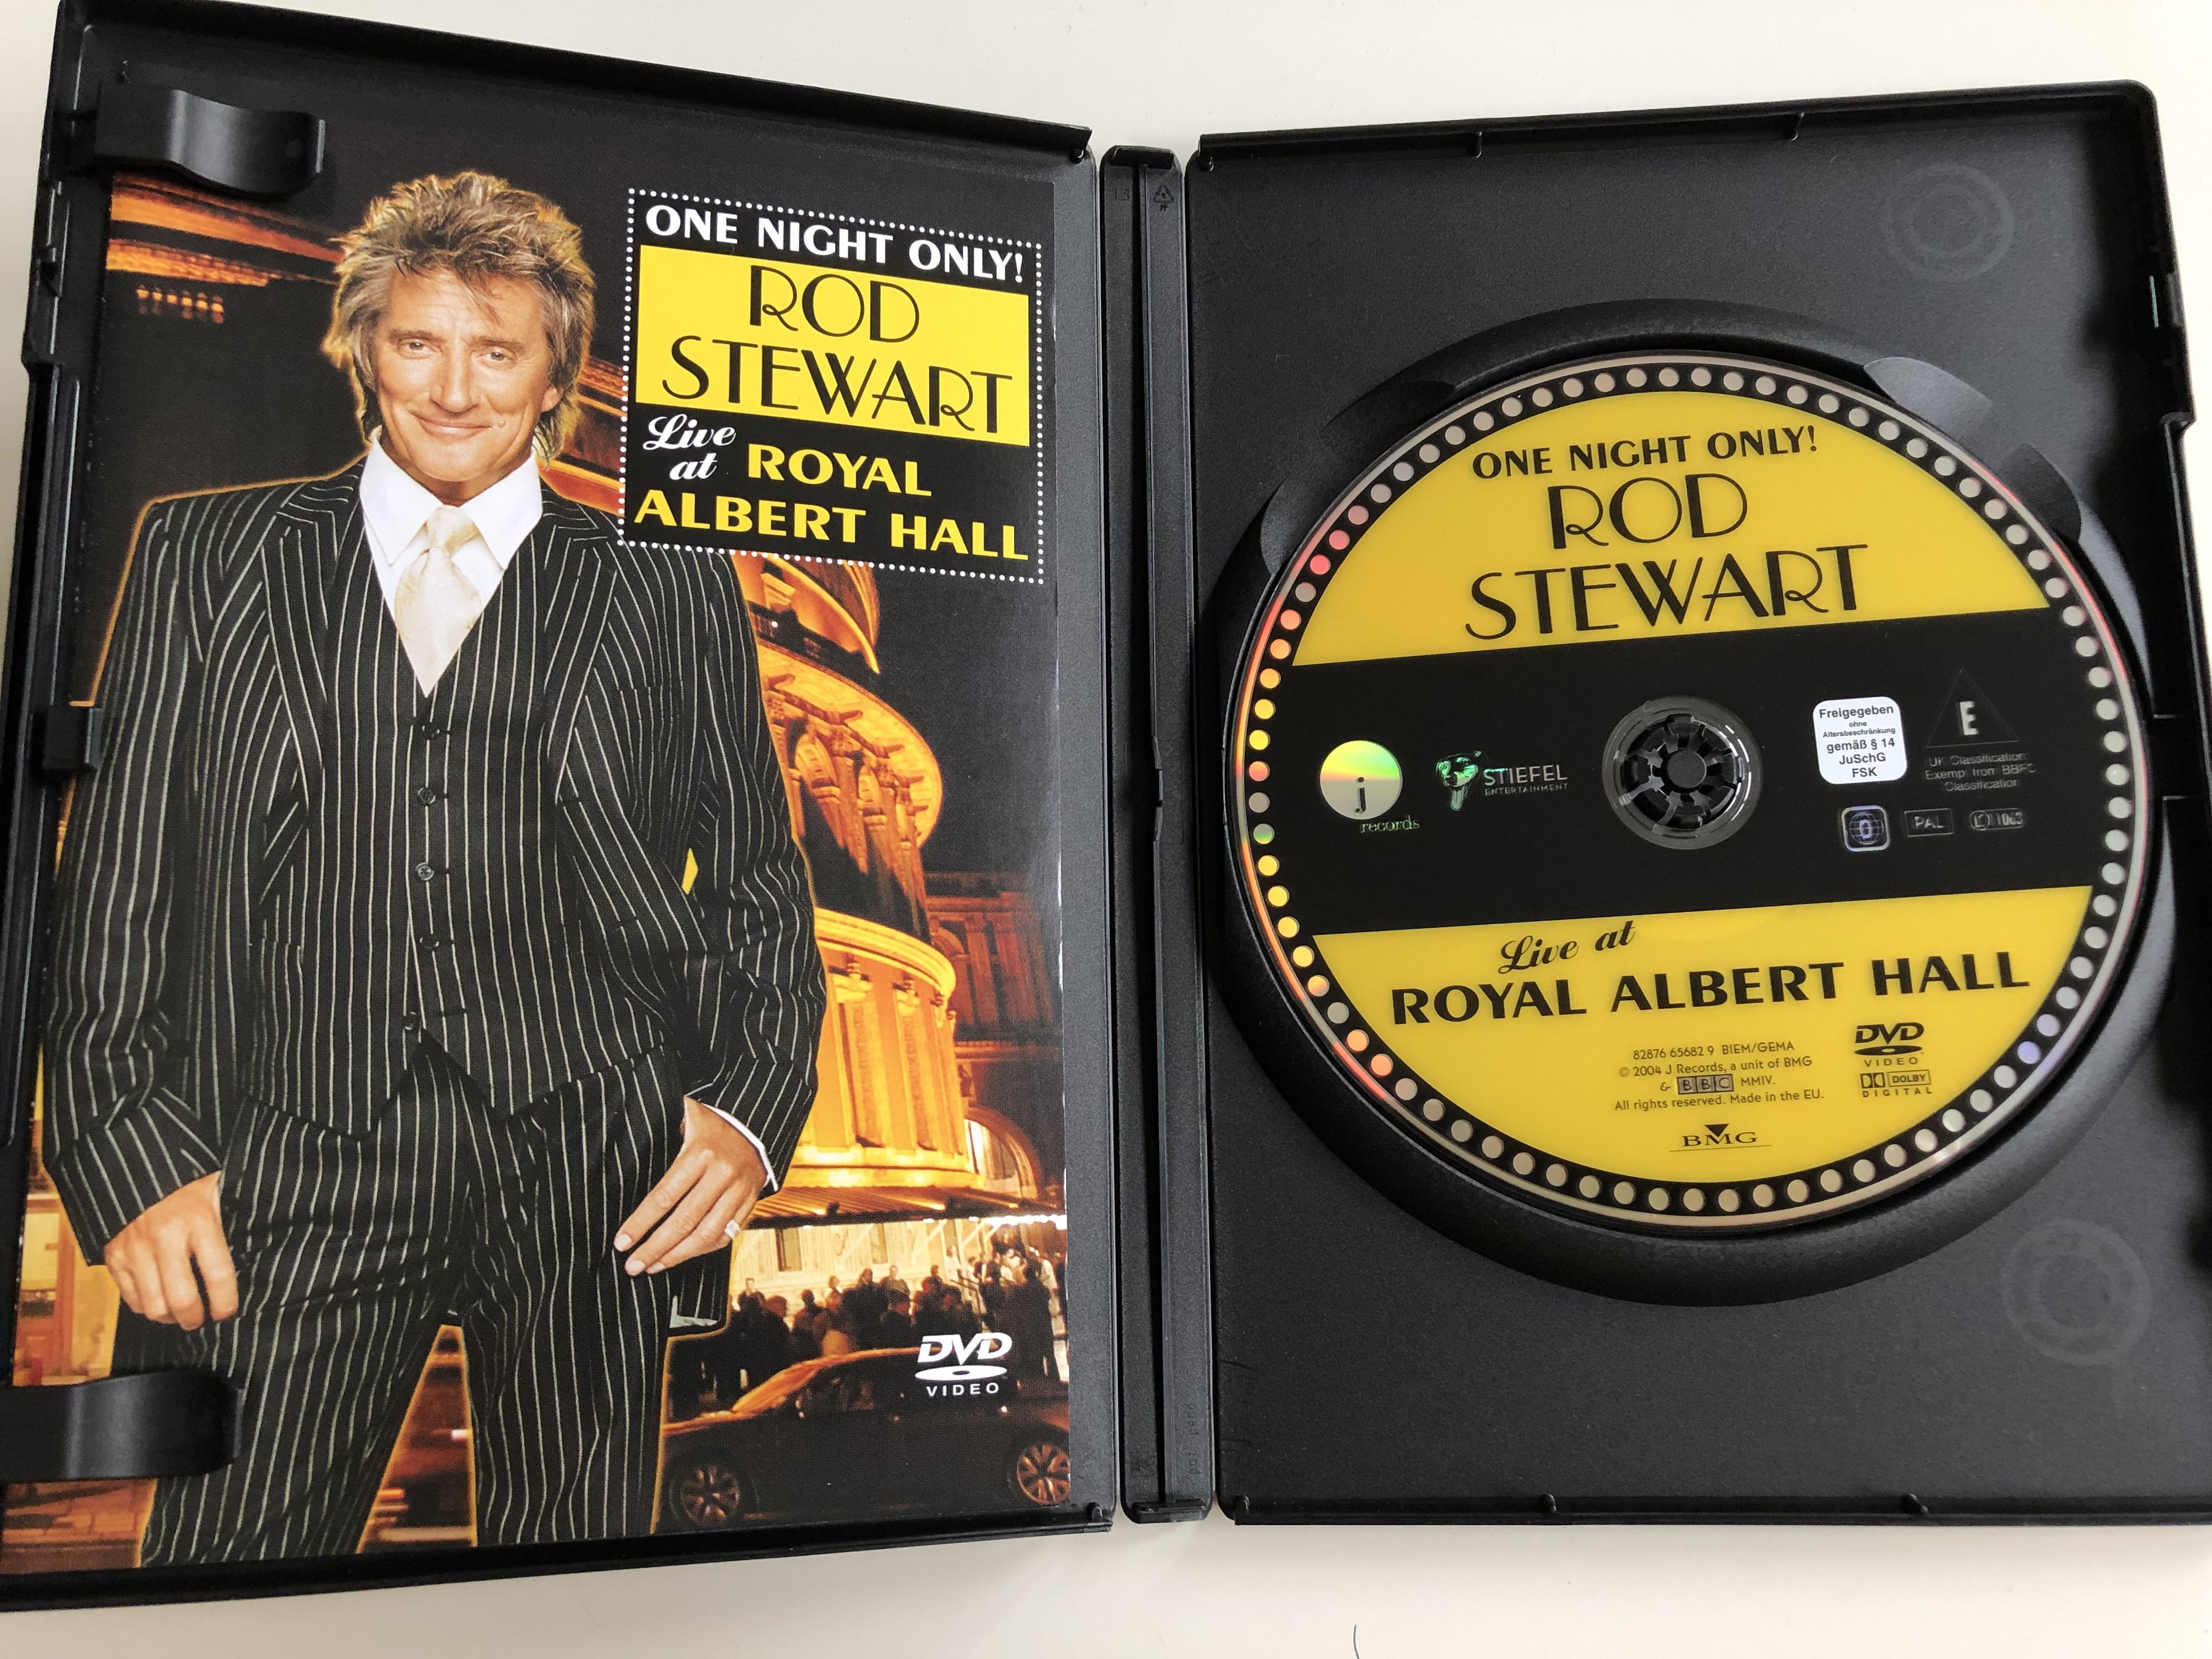 rod-stewart-live-at-royal-albert-hall-dvd-2004-one-night-only-bmg-bbc-2-.jpg